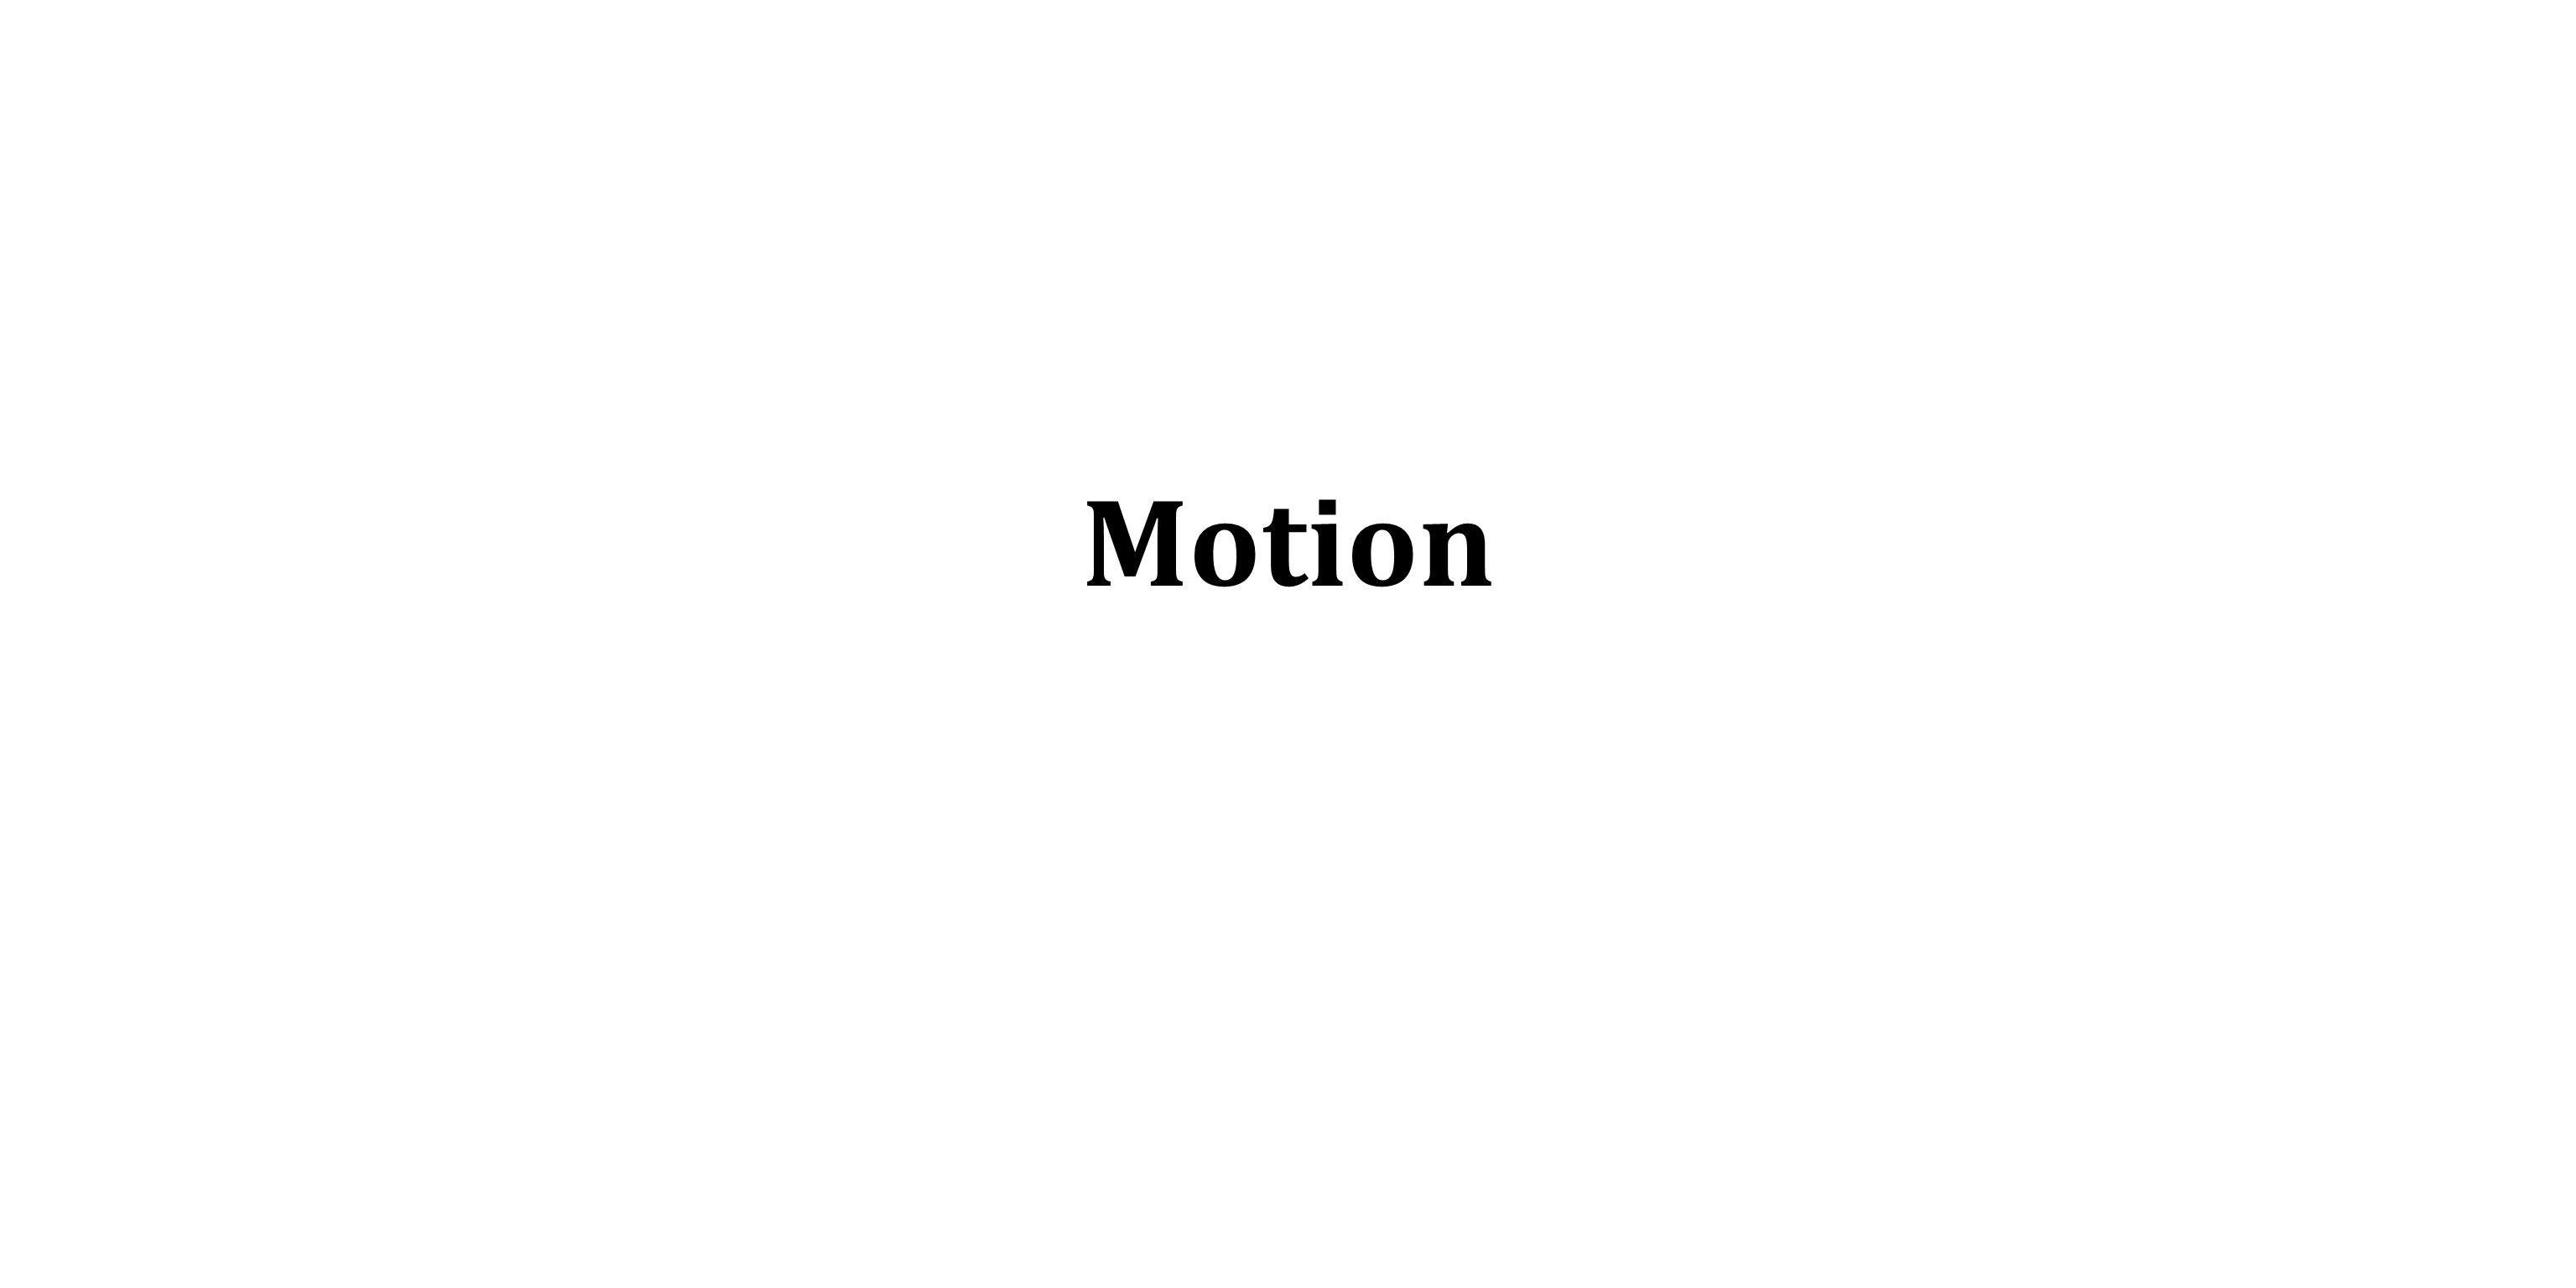 Pengenalan Cara Kerja Relative Motion (2) 2.